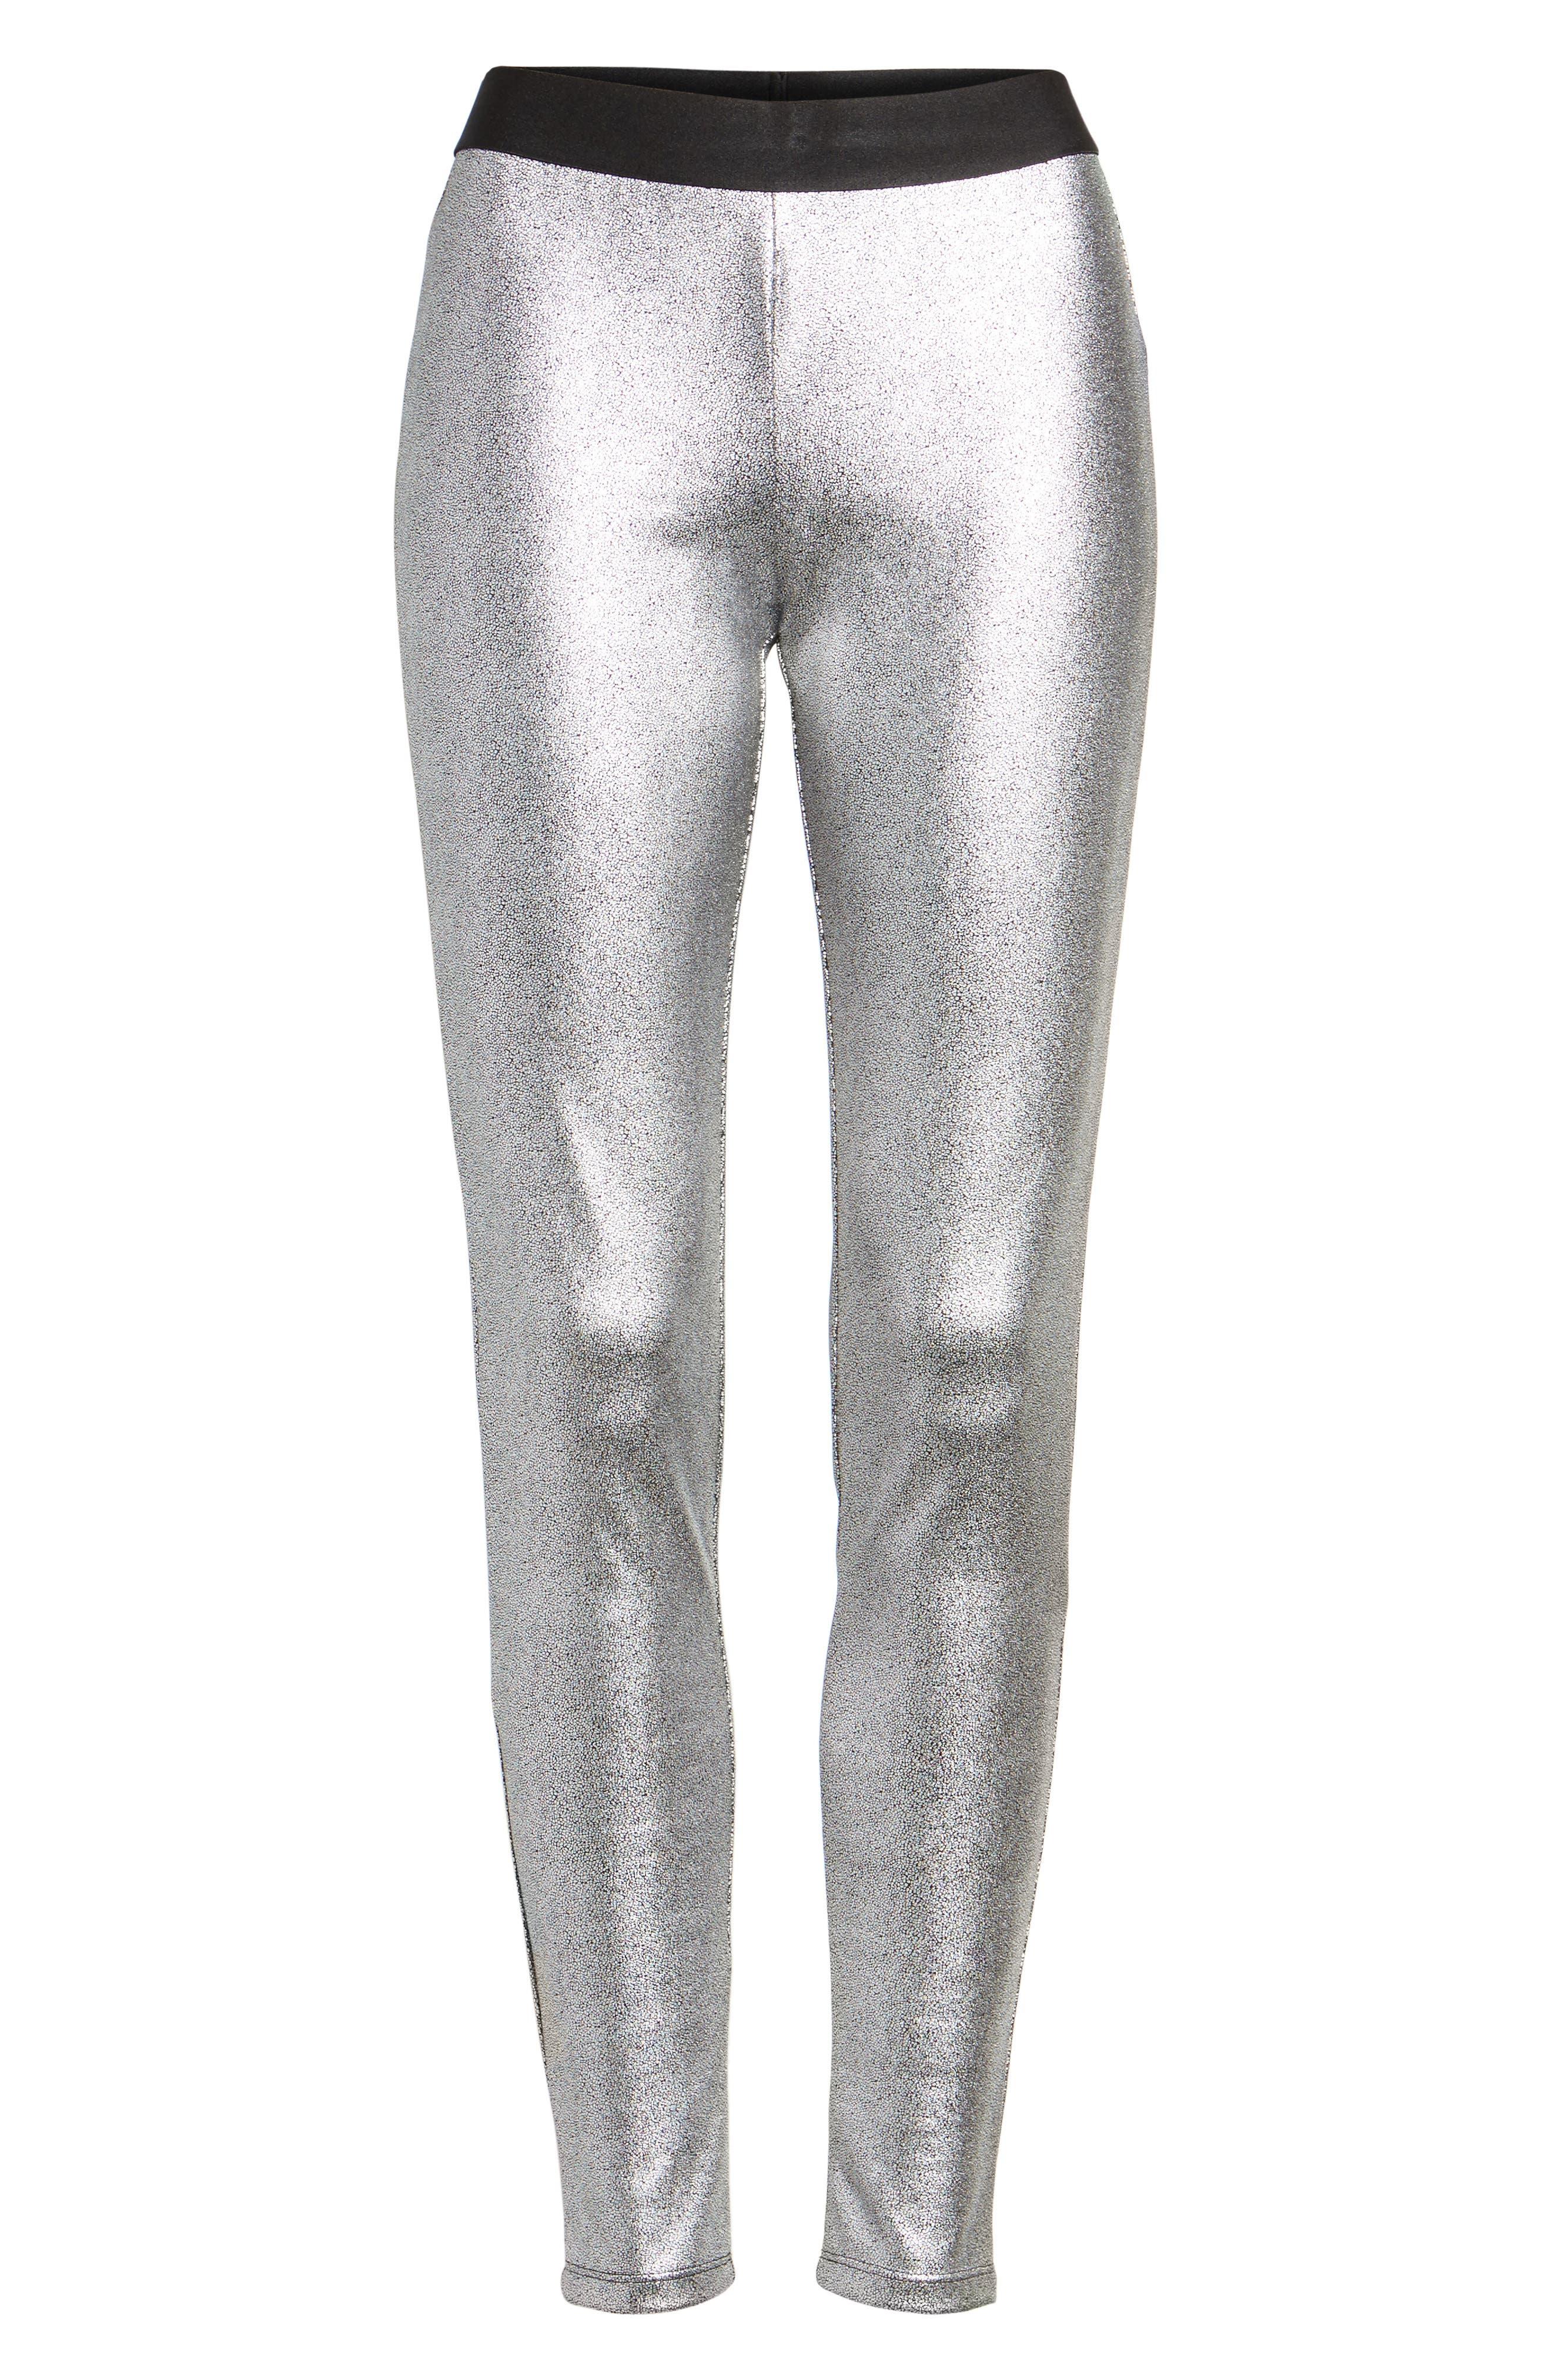 Metallic Leggings,                             Alternate thumbnail 6, color,                             040